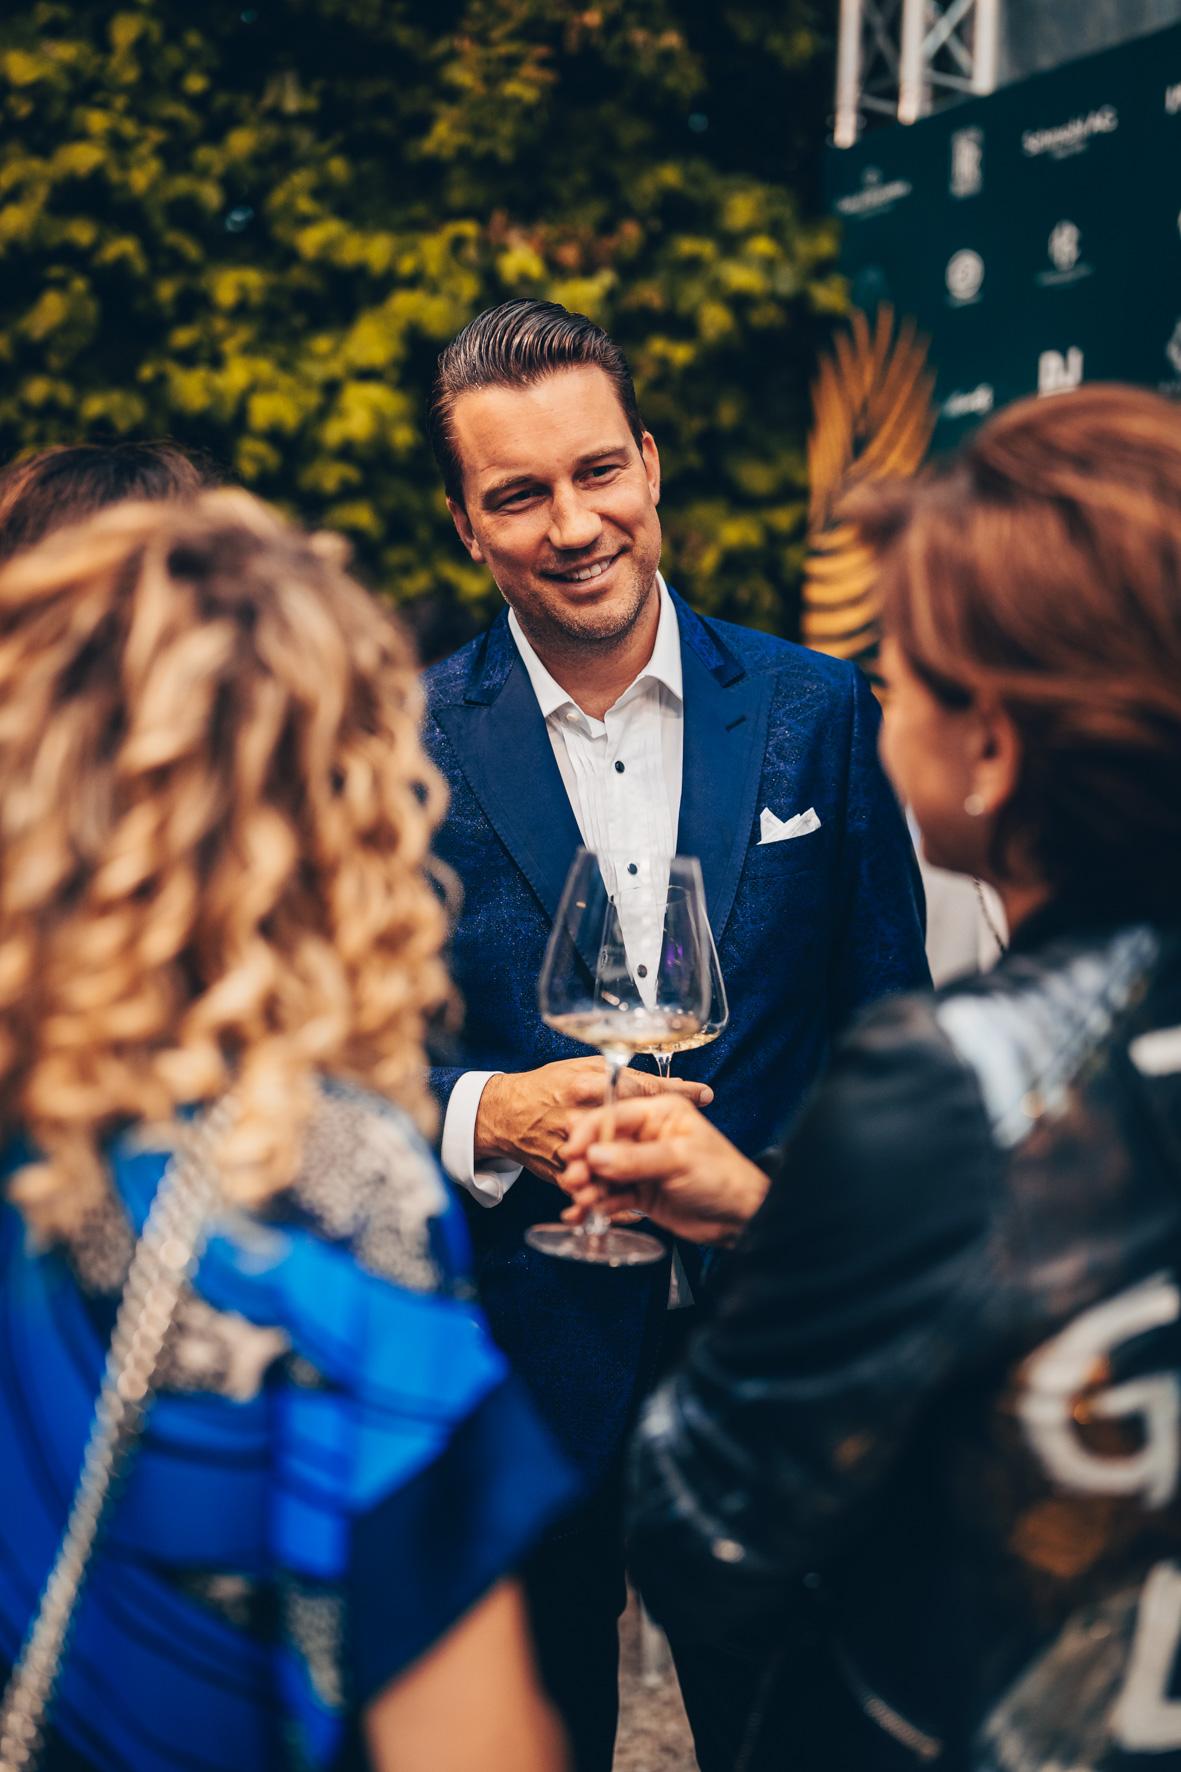 Konrad-lifestyle-art-basel-%22grand-party%22-2019-41.jpg